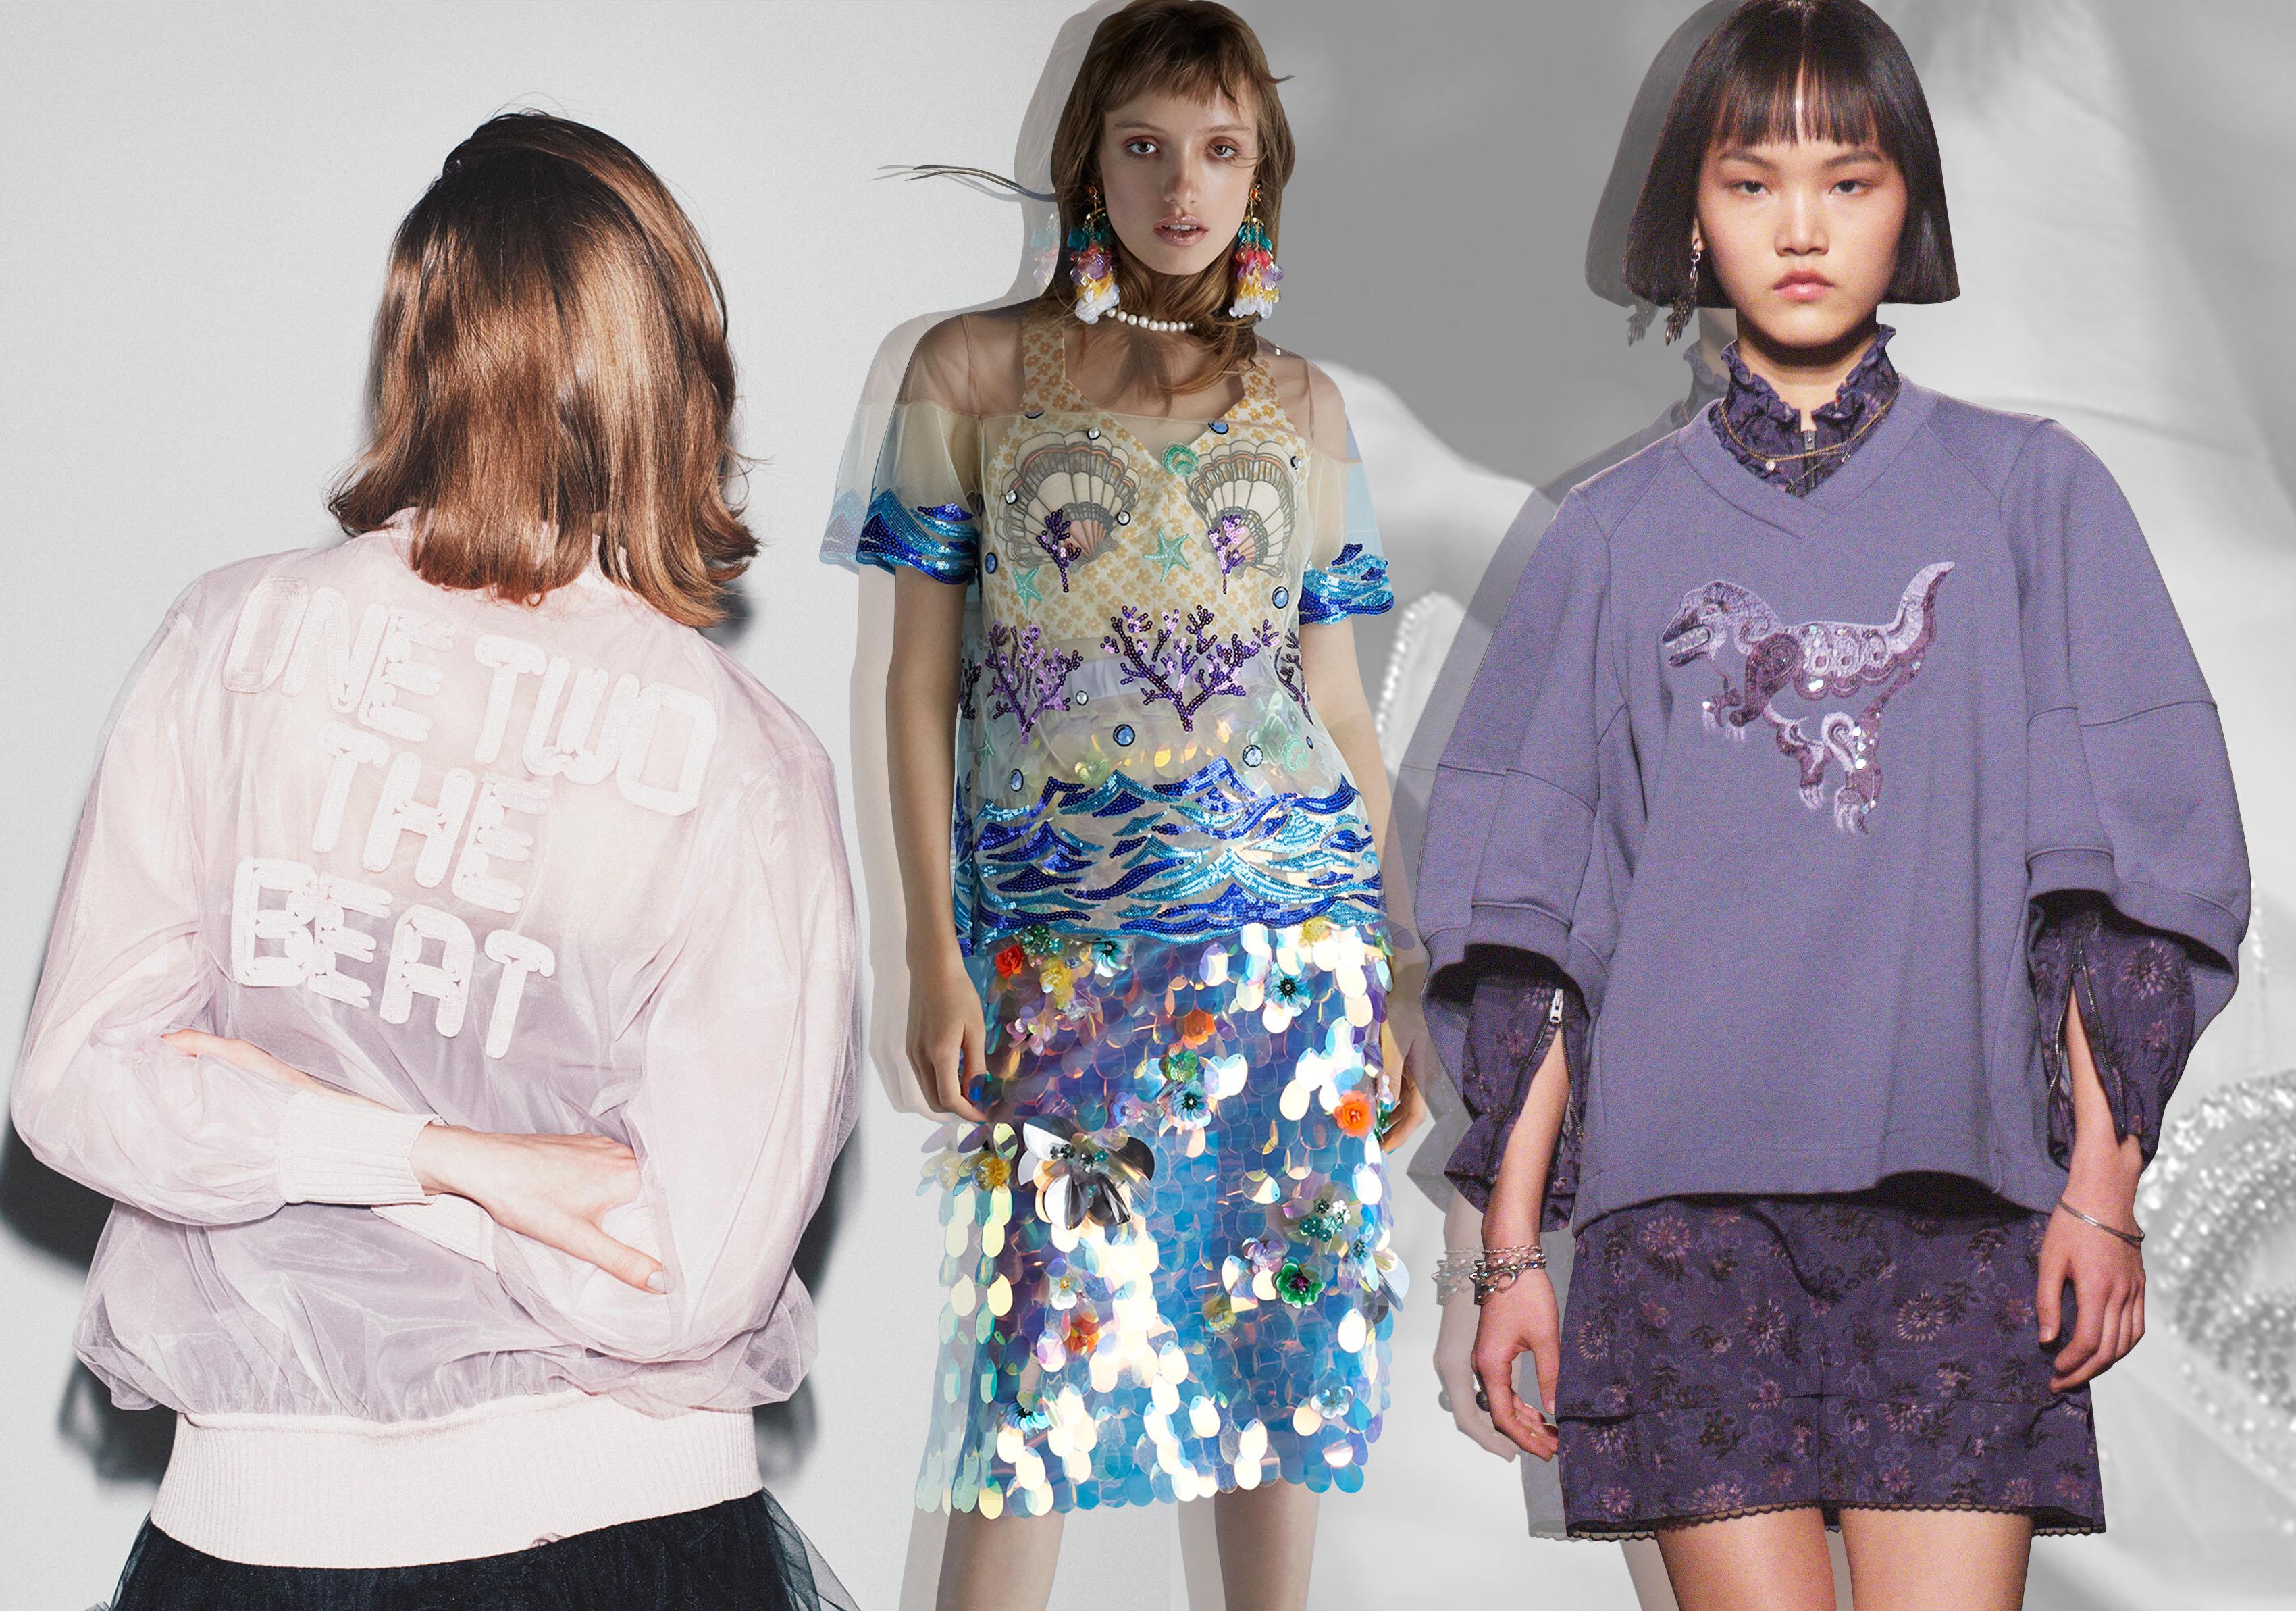 Stylish Girl -- 2020 S/S Pattern & Technique Trend for Womenswear